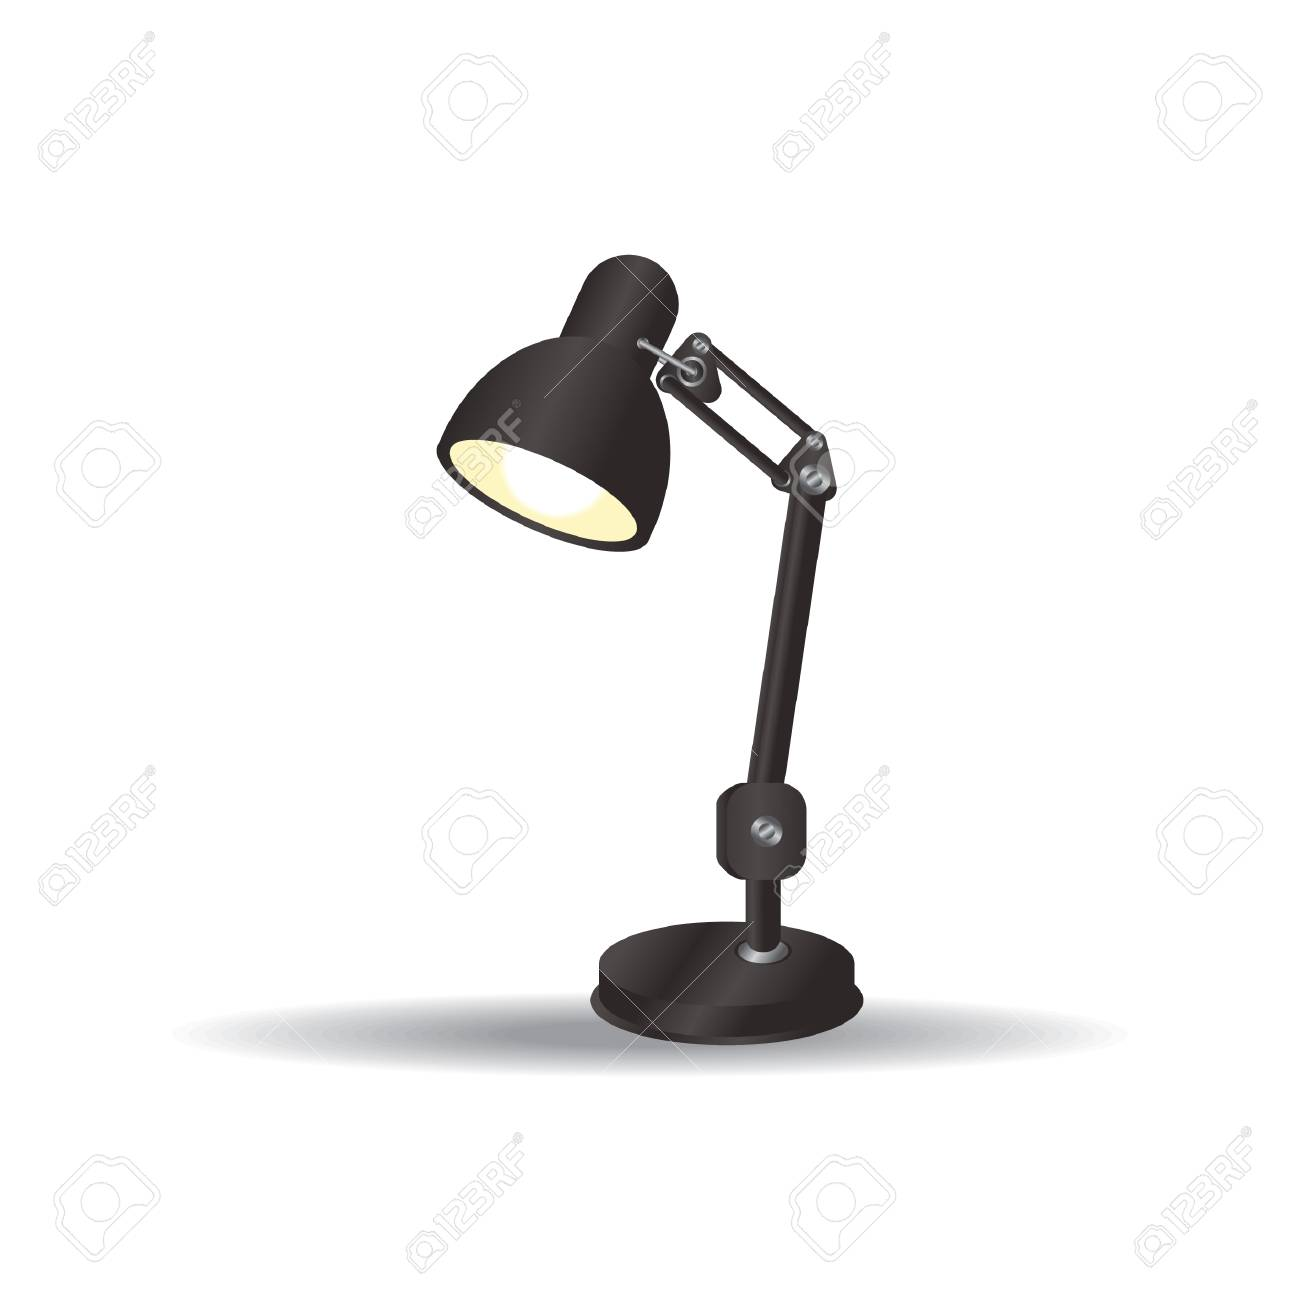 desk lamp - 106673522